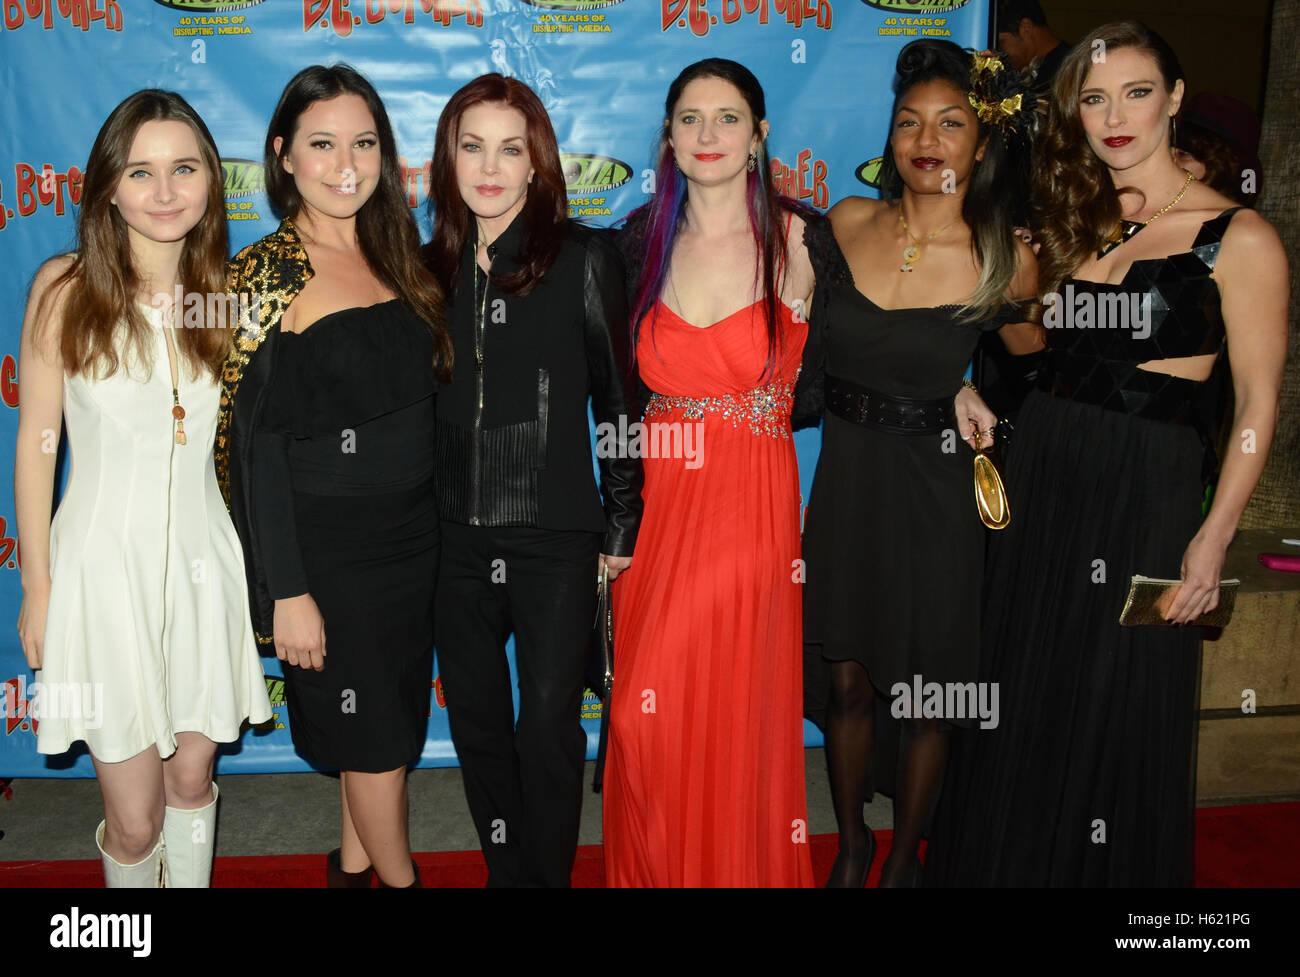 Kansas Bowling, Leilani Fideler, Priscilla Presley, Miranda Robin, Deryn Leah and Krista Fettke arrives at the 'BC - Stock Image